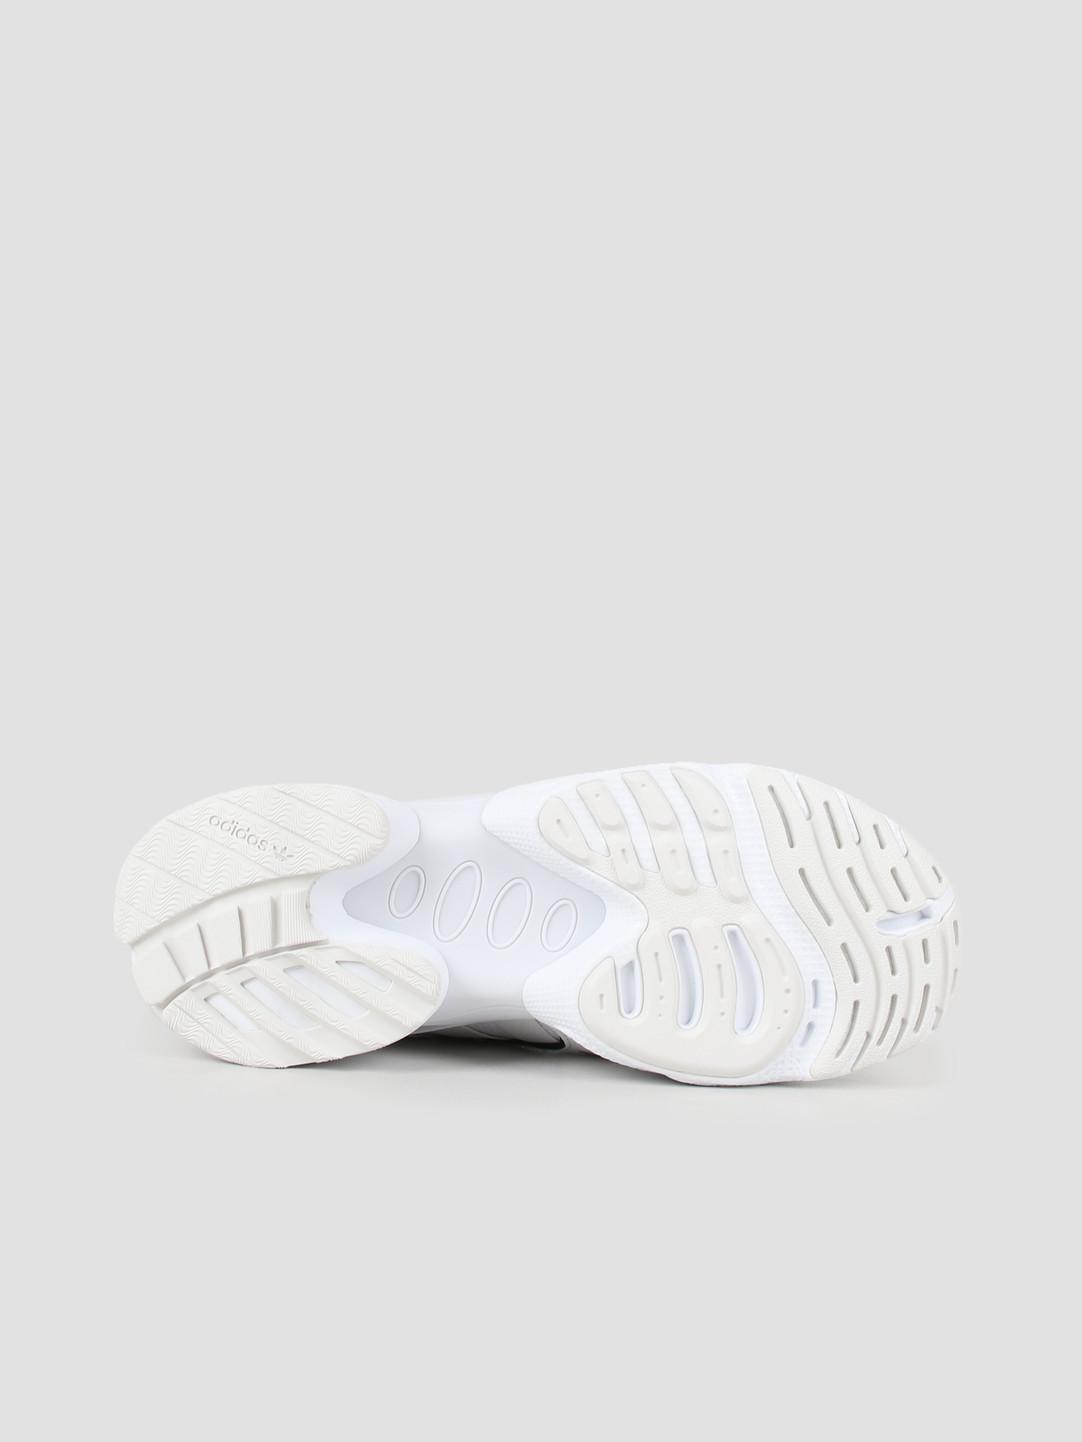 adidas adidas EQT Gazelle Crywht Crywht Cblack EE7744